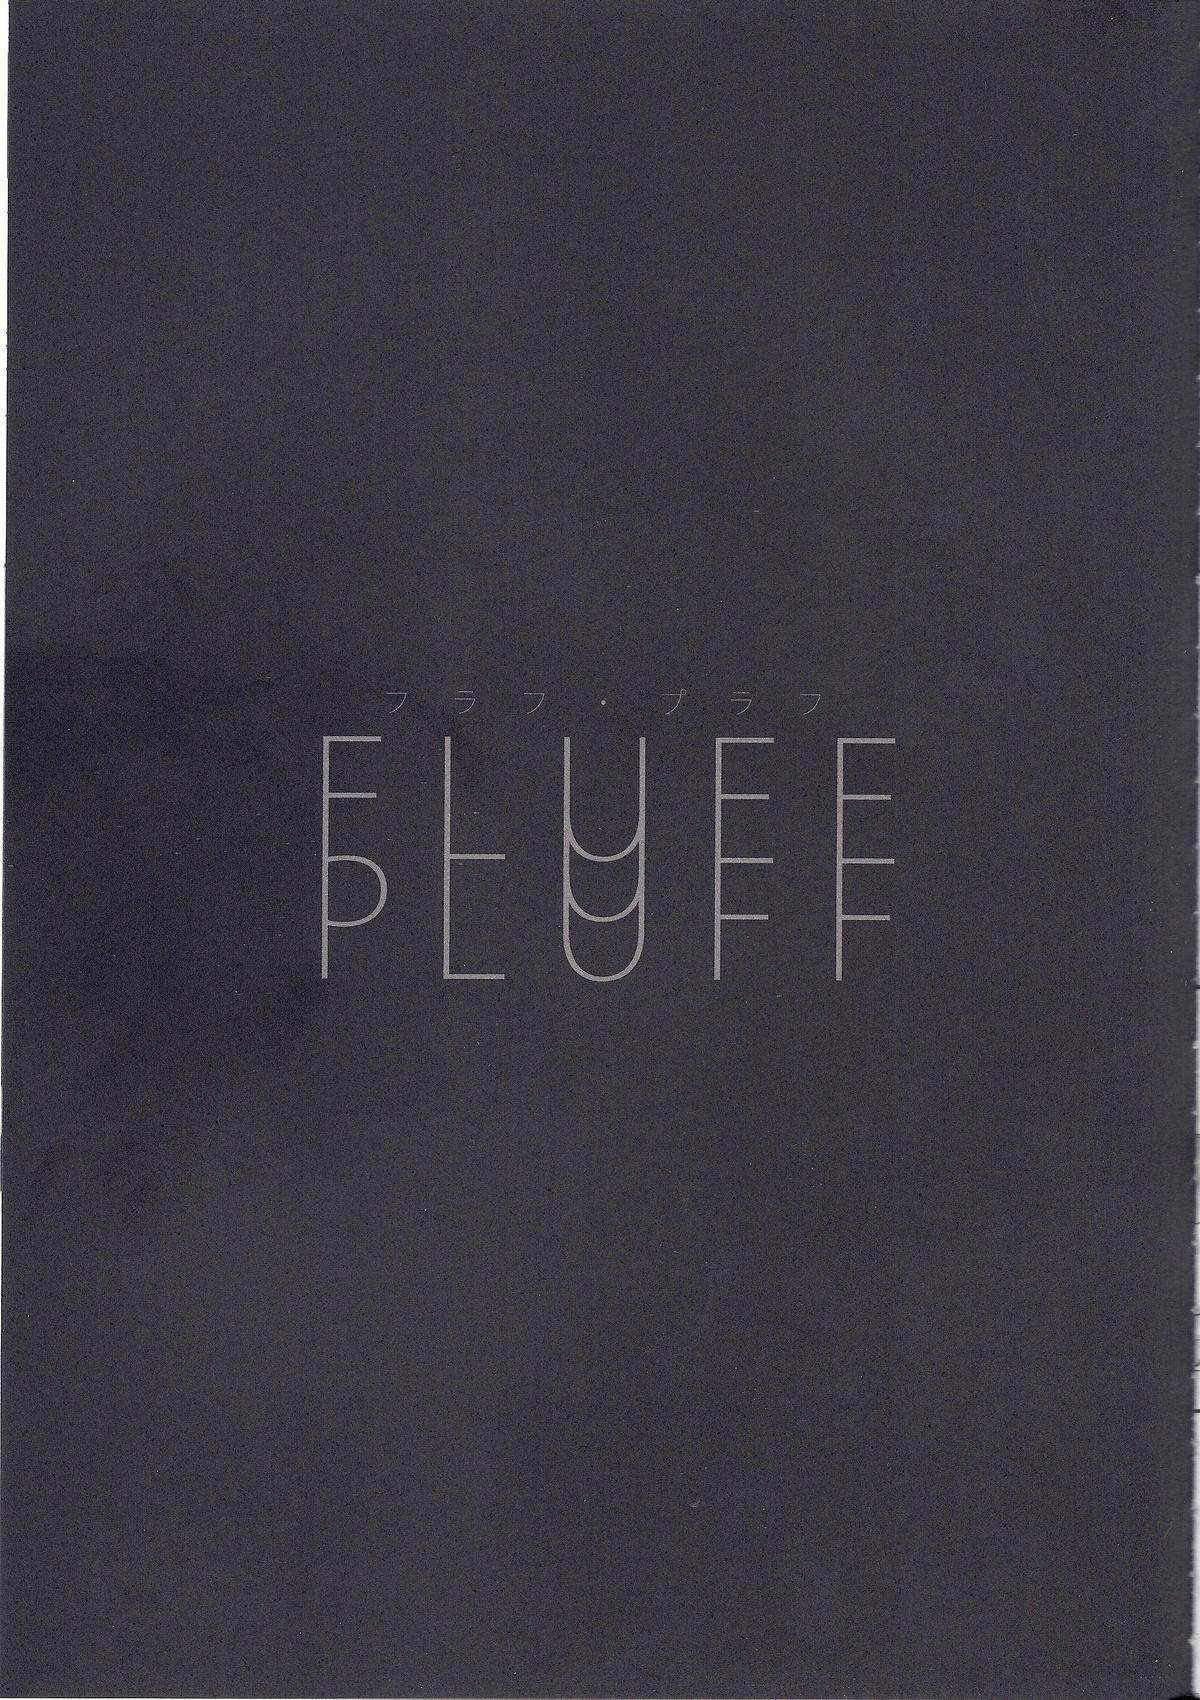 FLUFF PLUFF 21